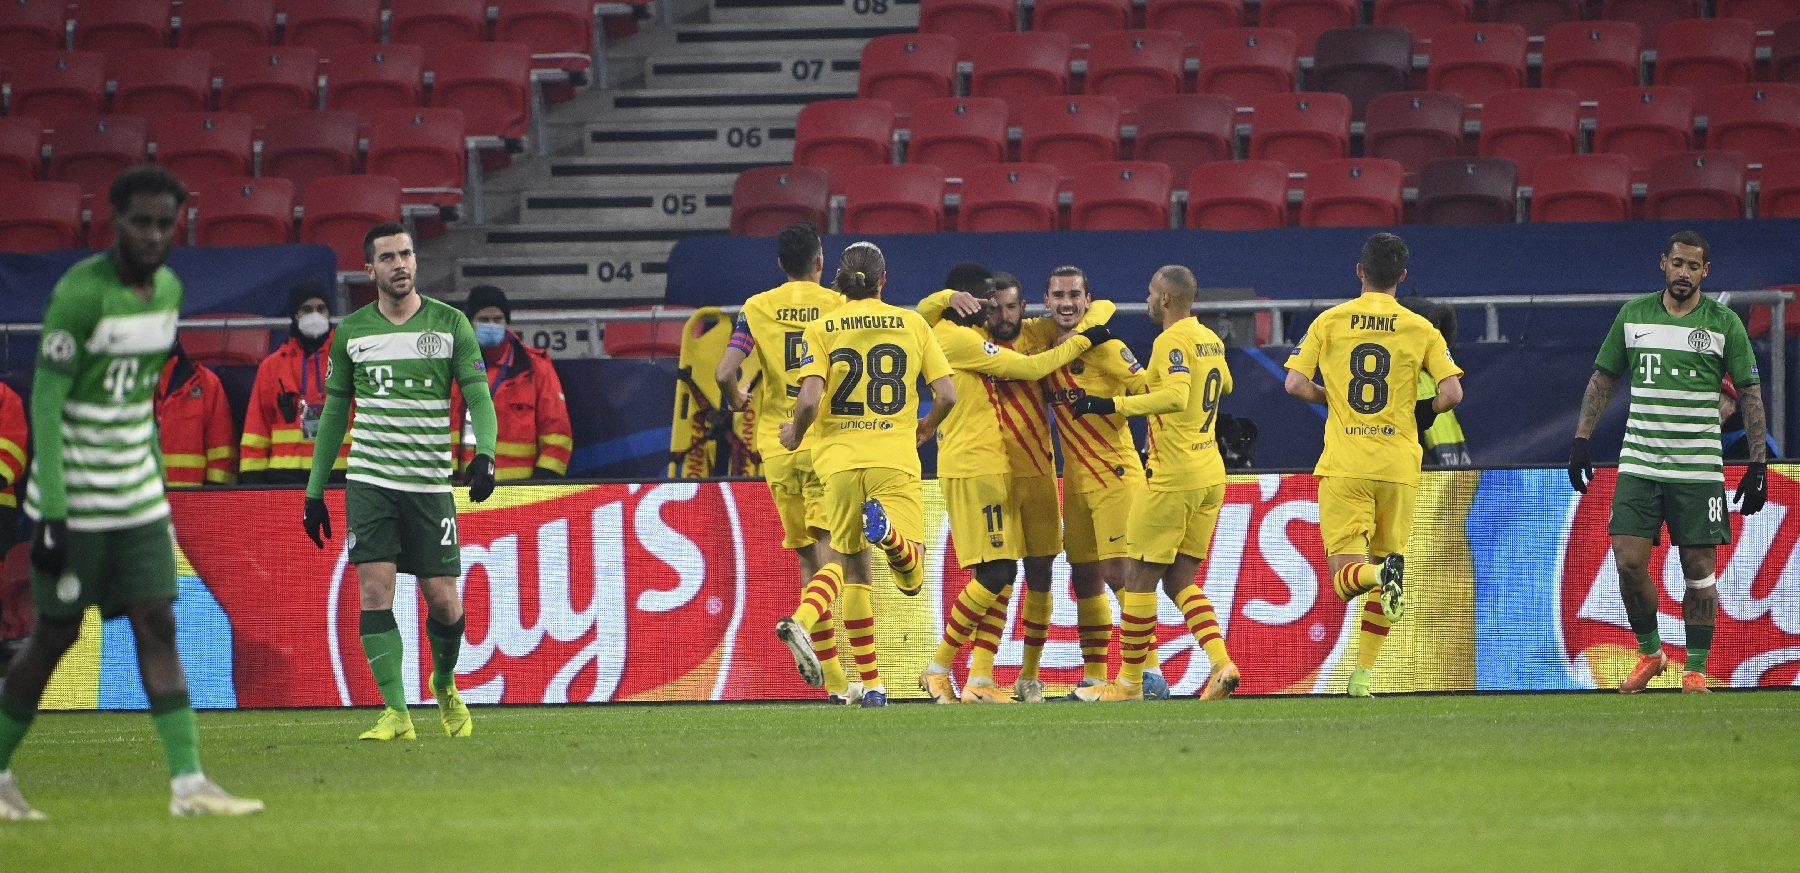 Barca defeated again Fradi in the Puskás Arena